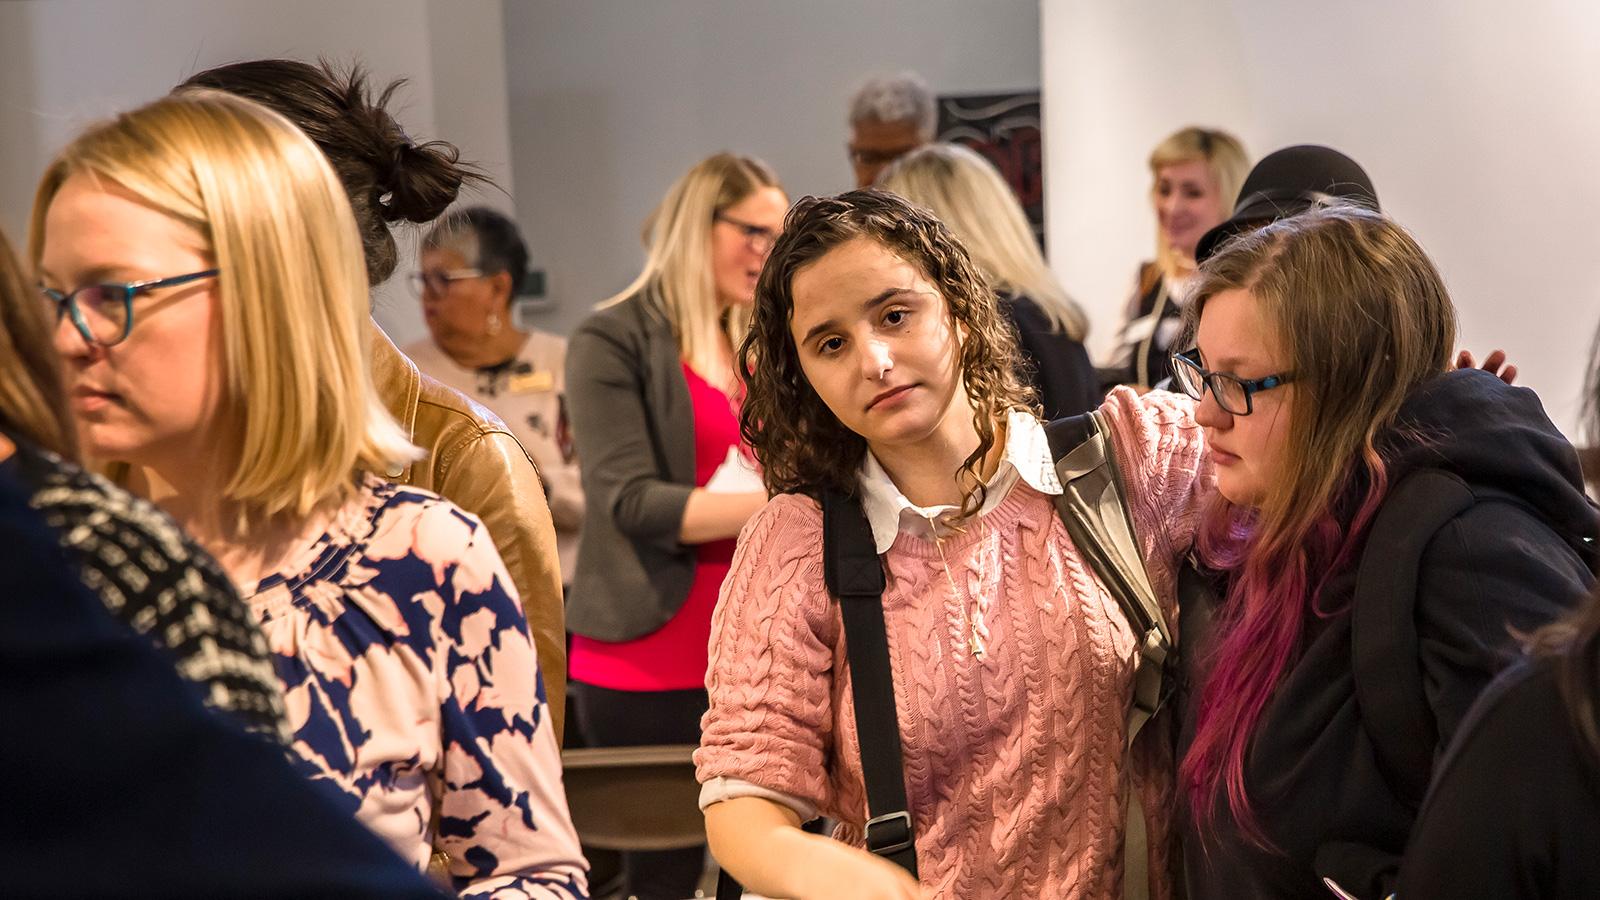 Students mingle at community gathering